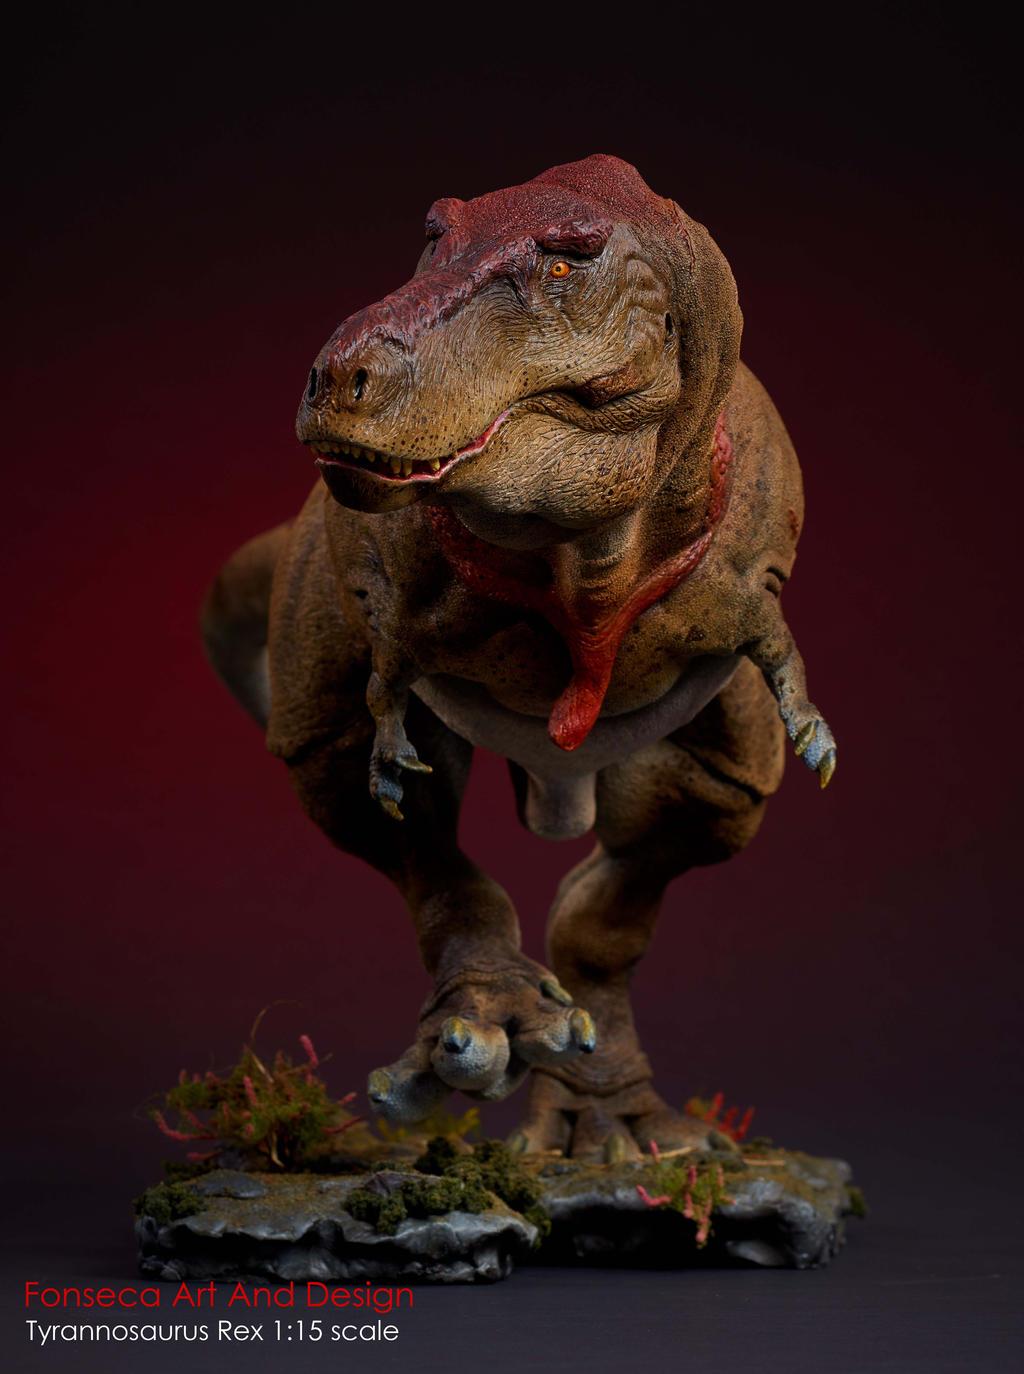 Tyrannosaurus Rex 1:15 scale model